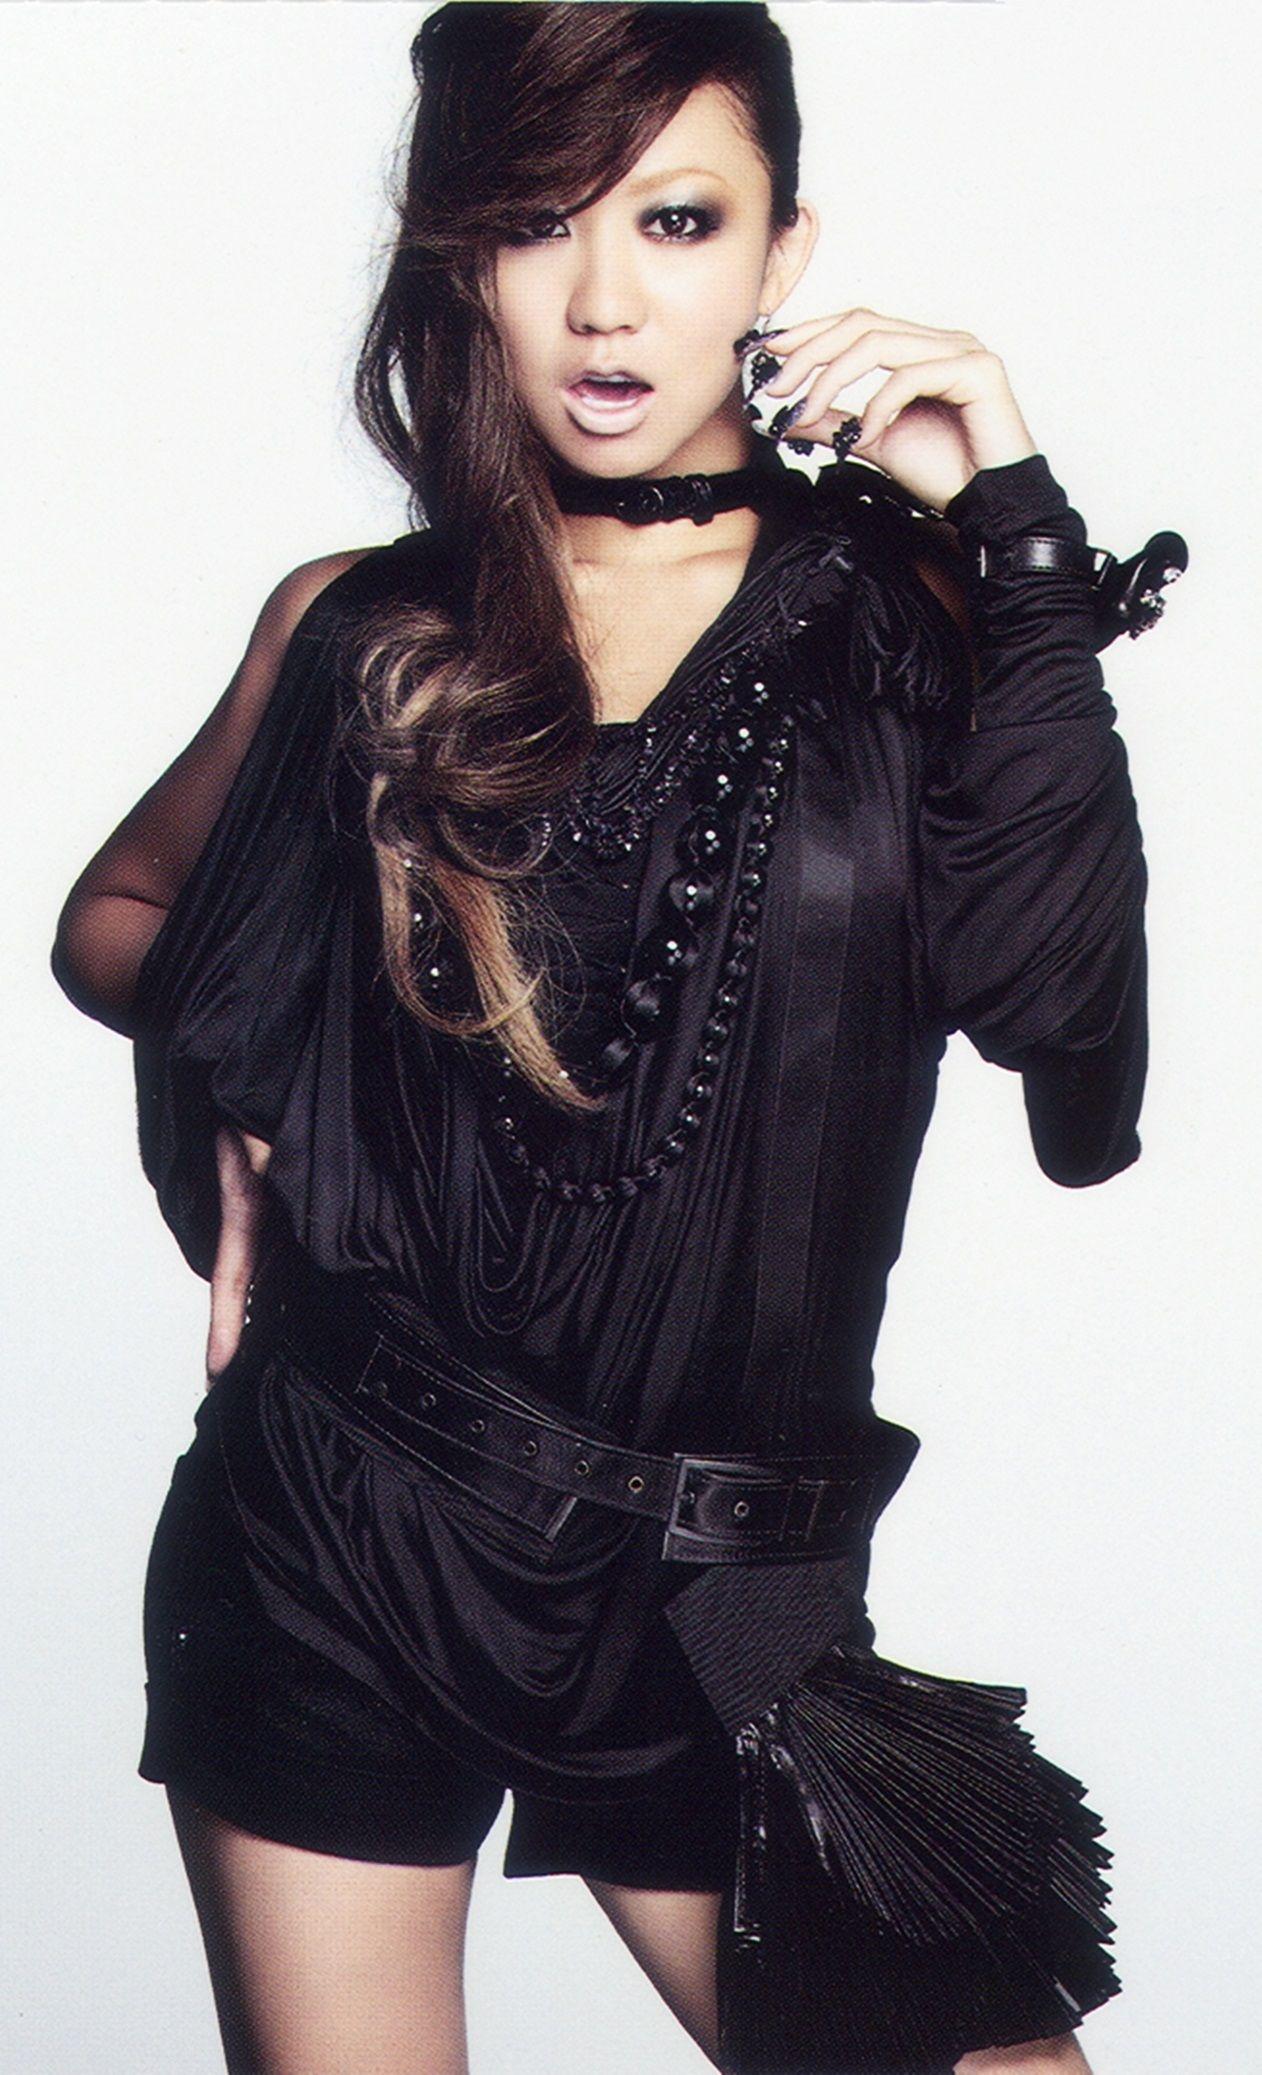 Koda Kumi ファッションアイデア, 女性, ファッション